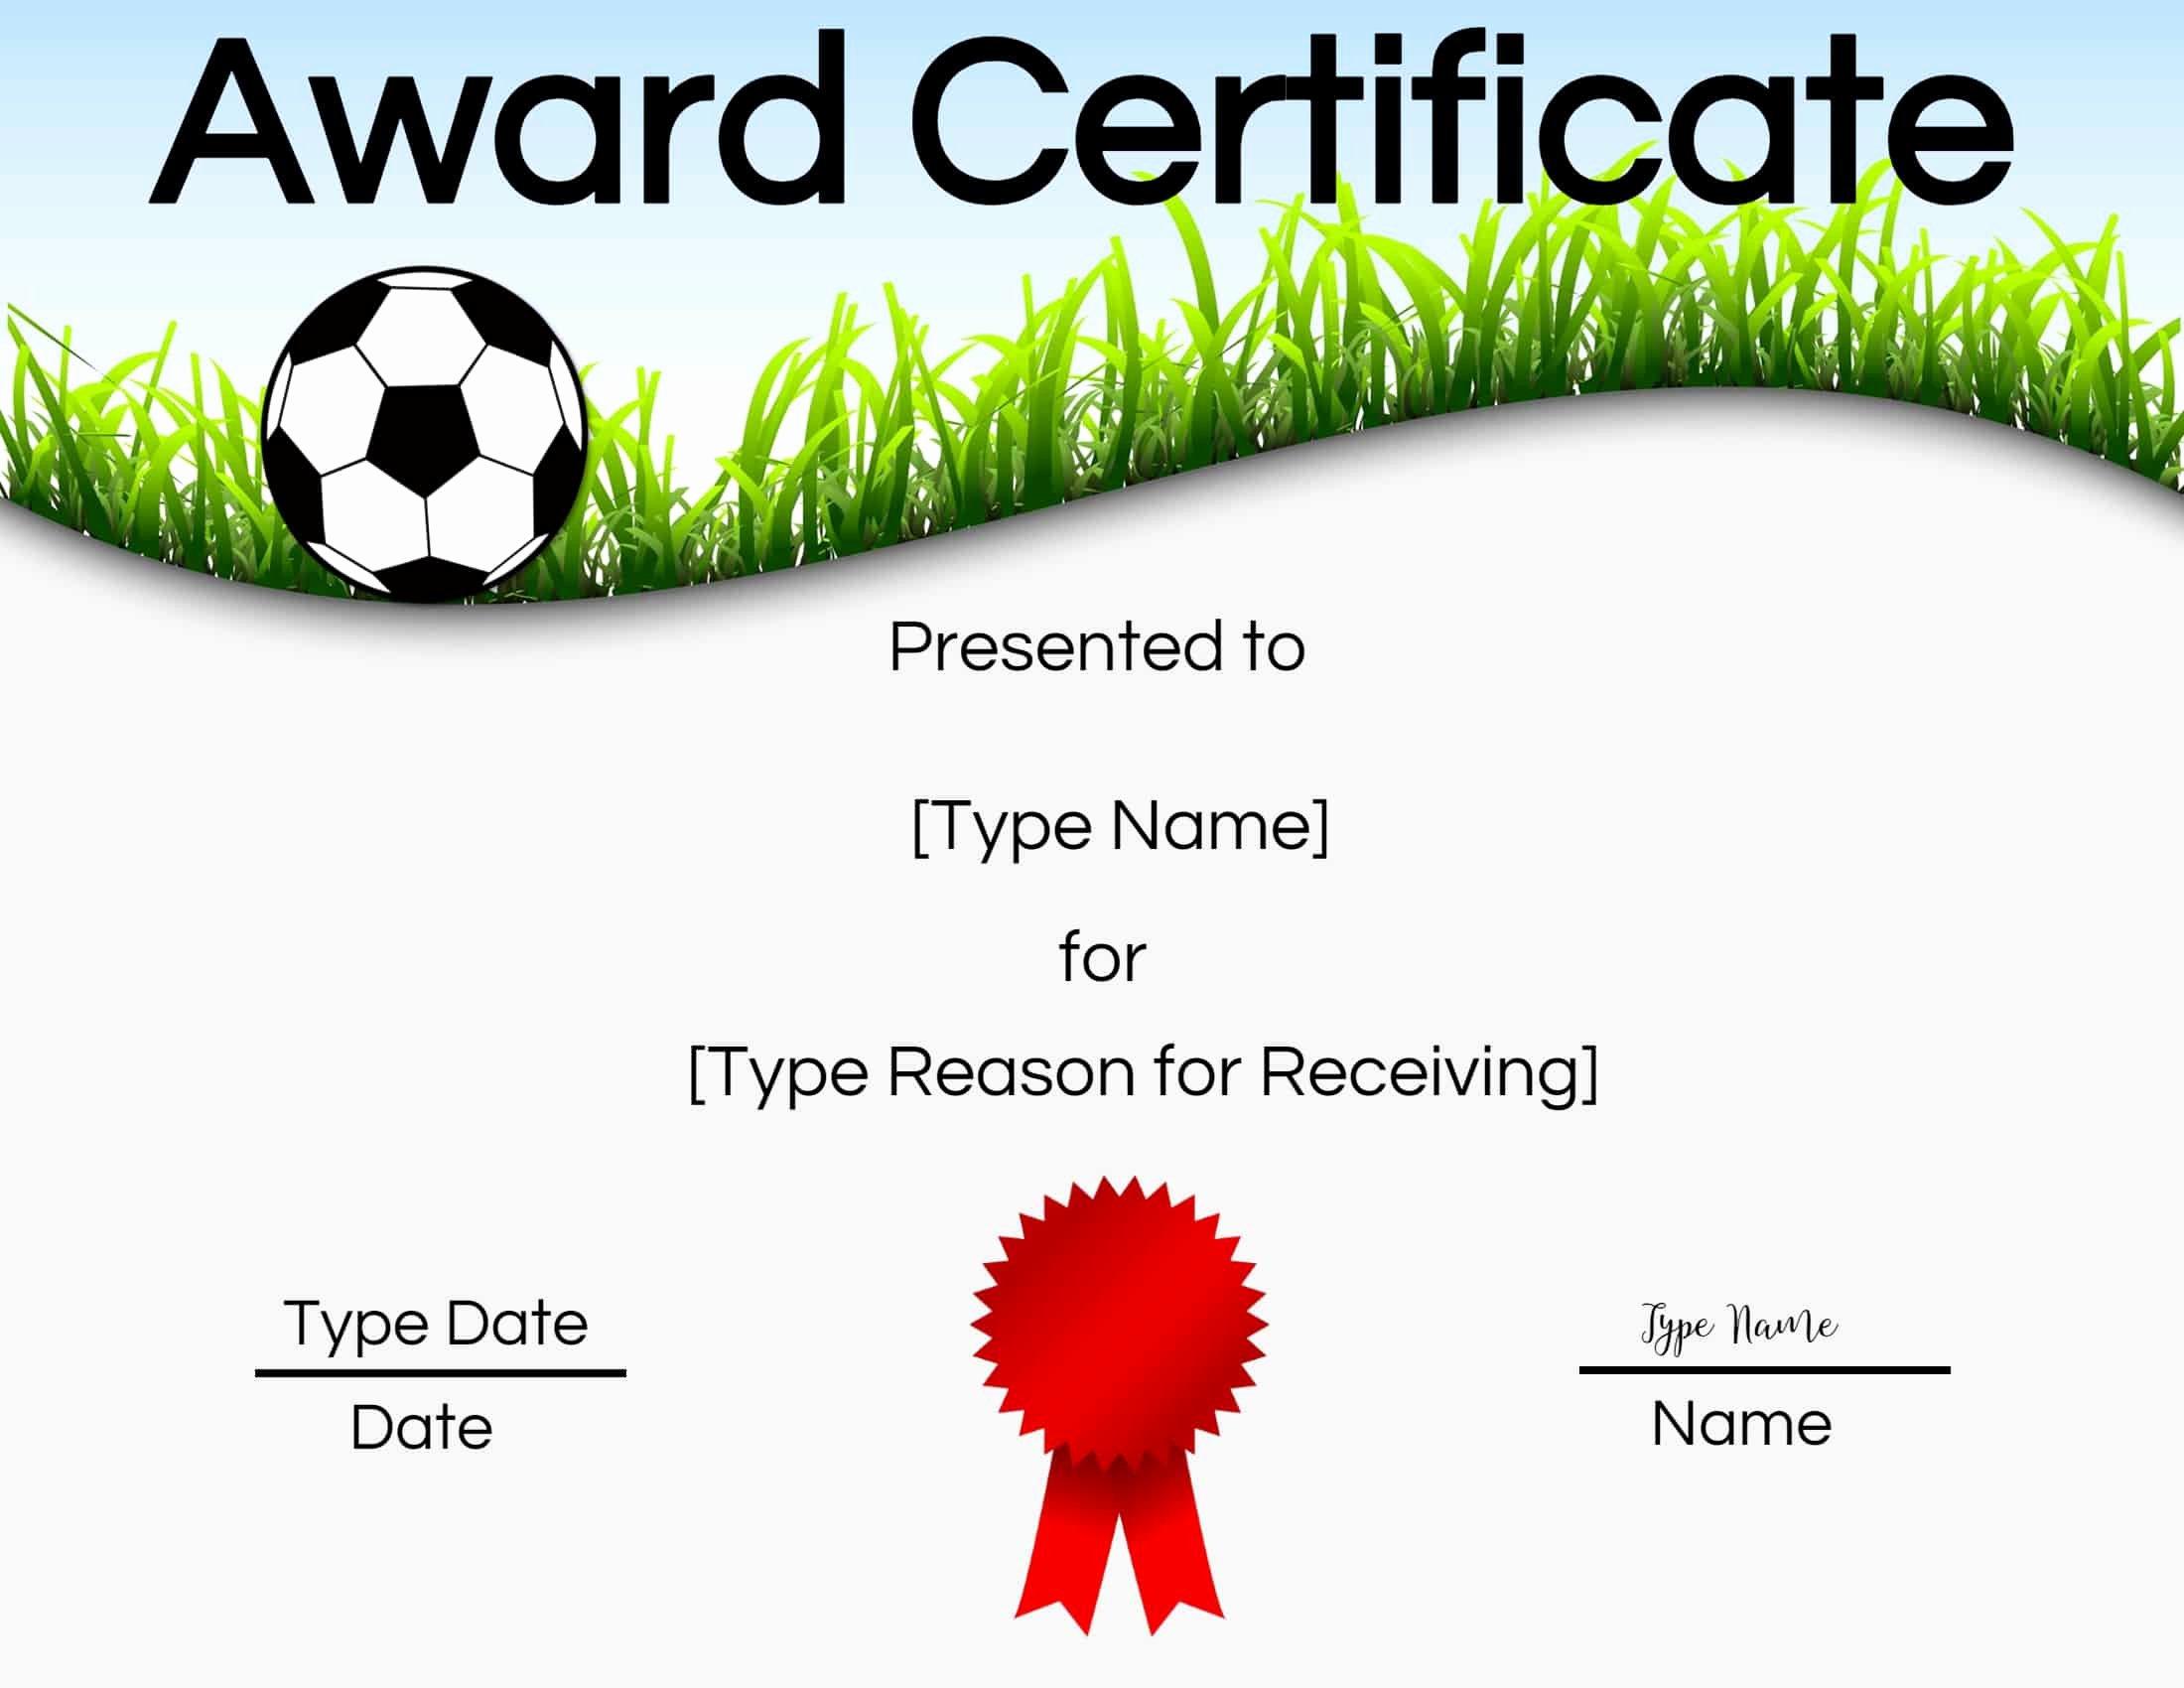 Soccer Awards Certificates Templates Unique Free soccer Certificate Maker